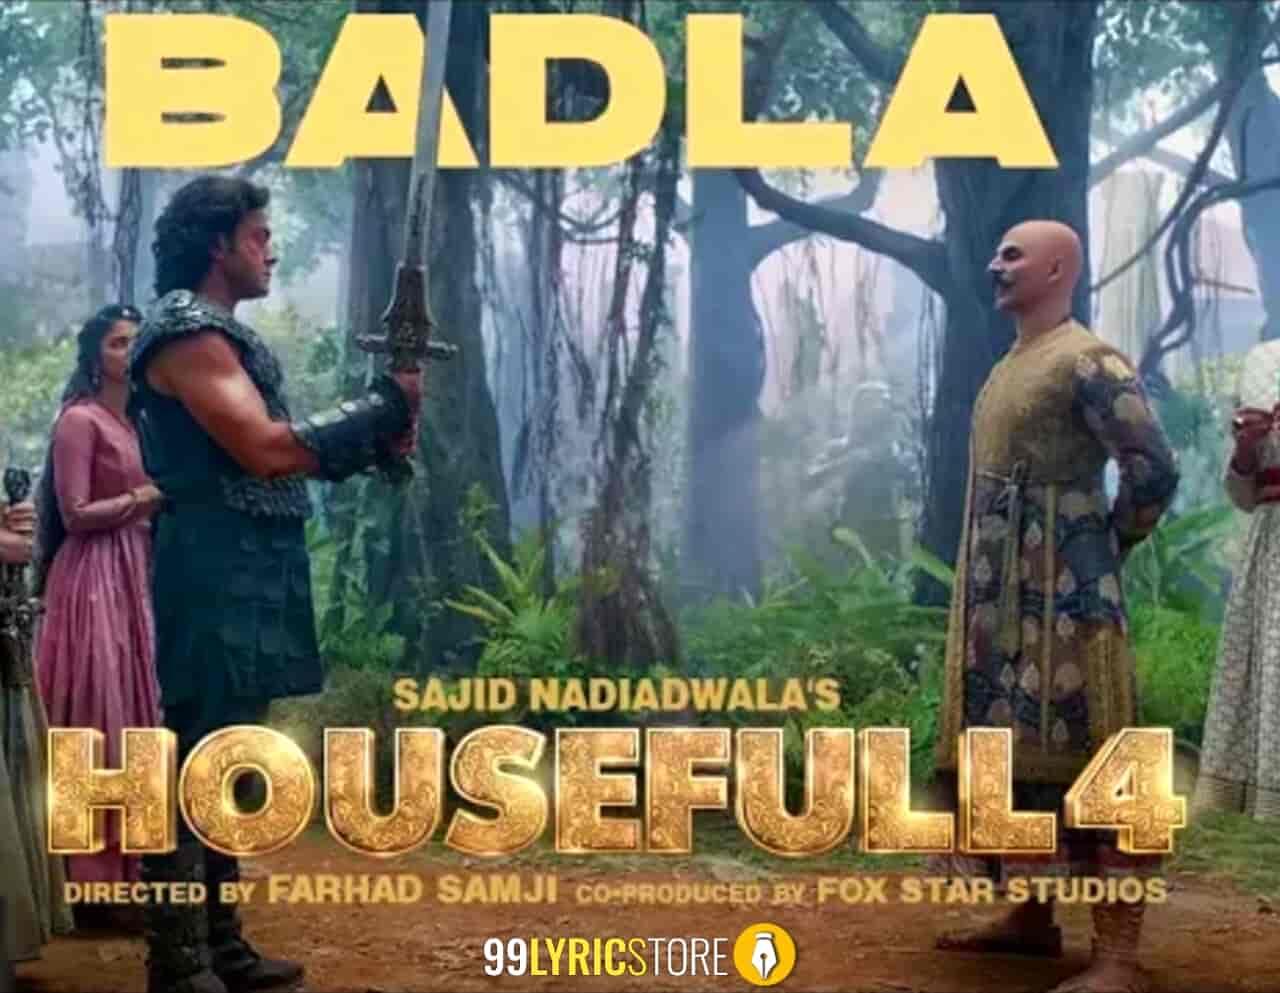 Badla Housefull 4 Song Images